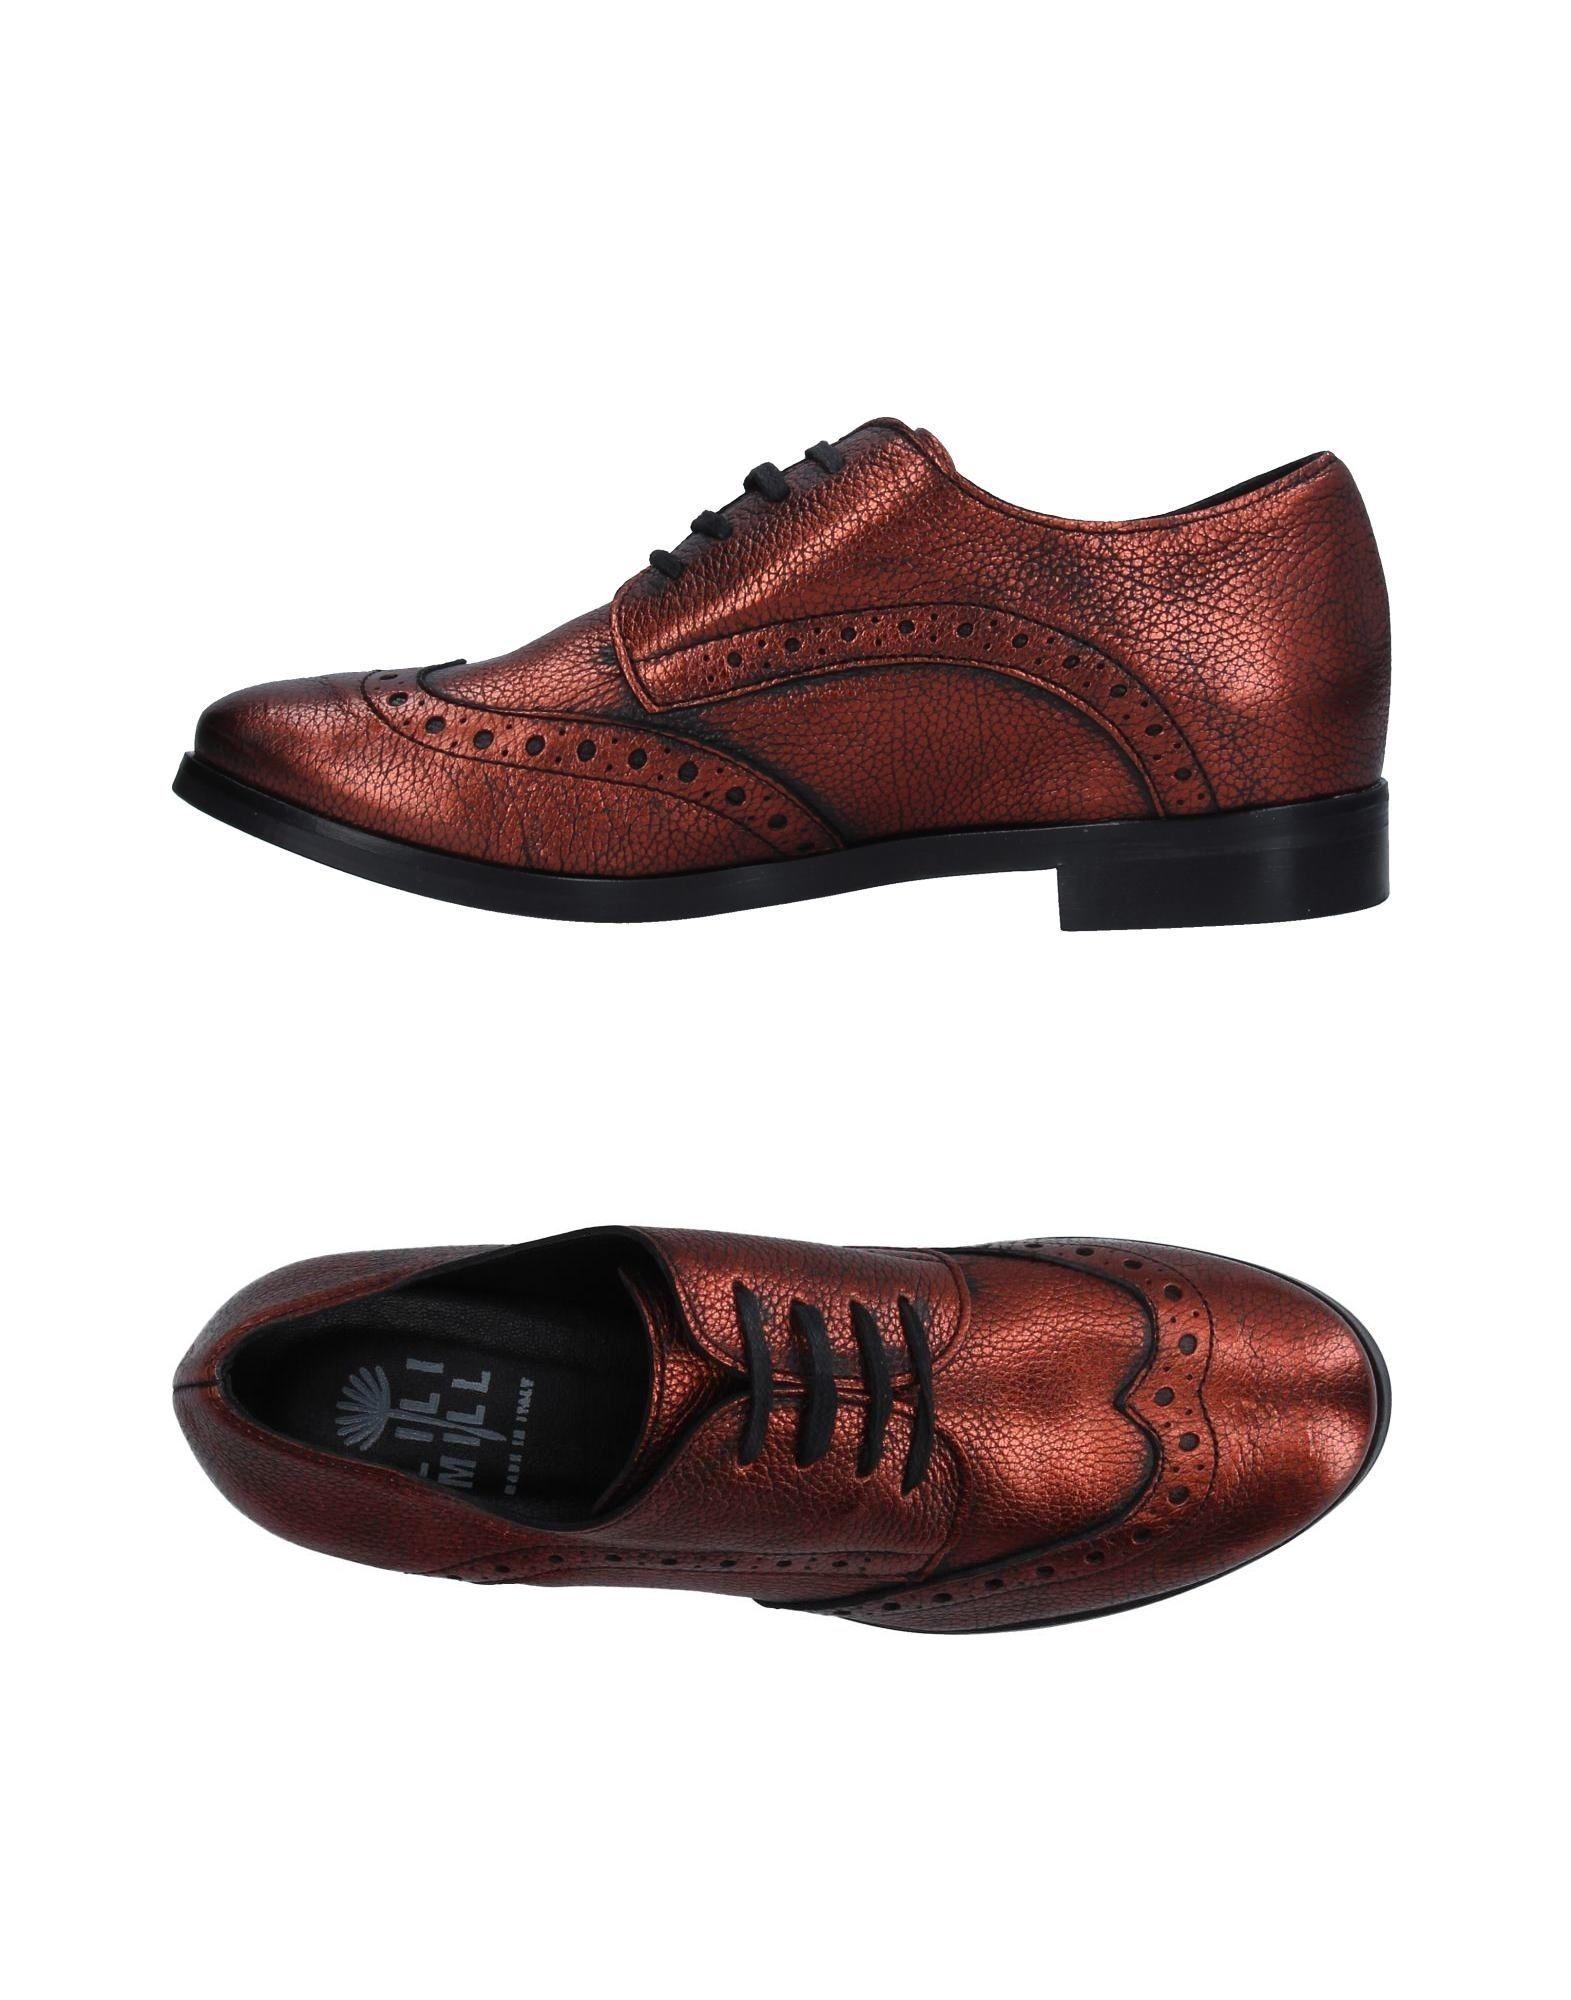 Lilimill Schnürschuhe Damen  11269514KI Gute Qualität beliebte Schuhe